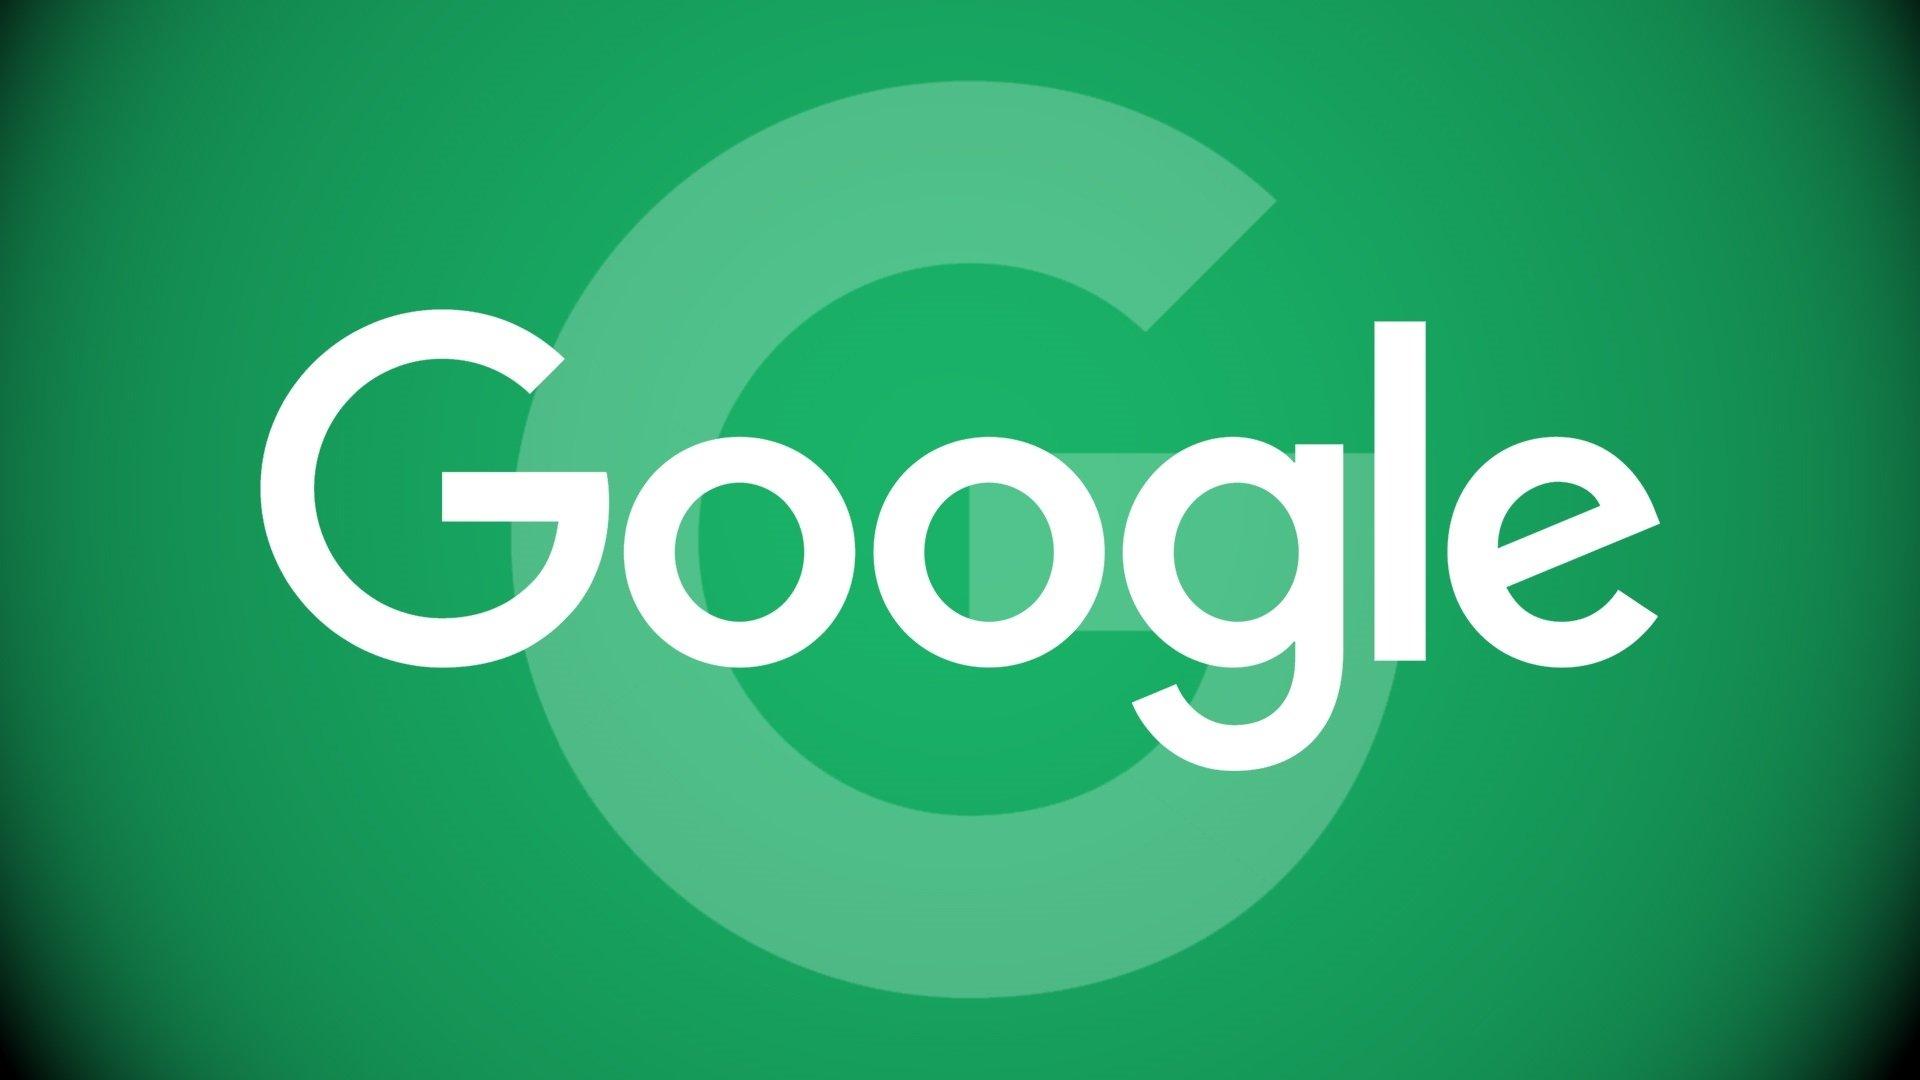 Google Verde